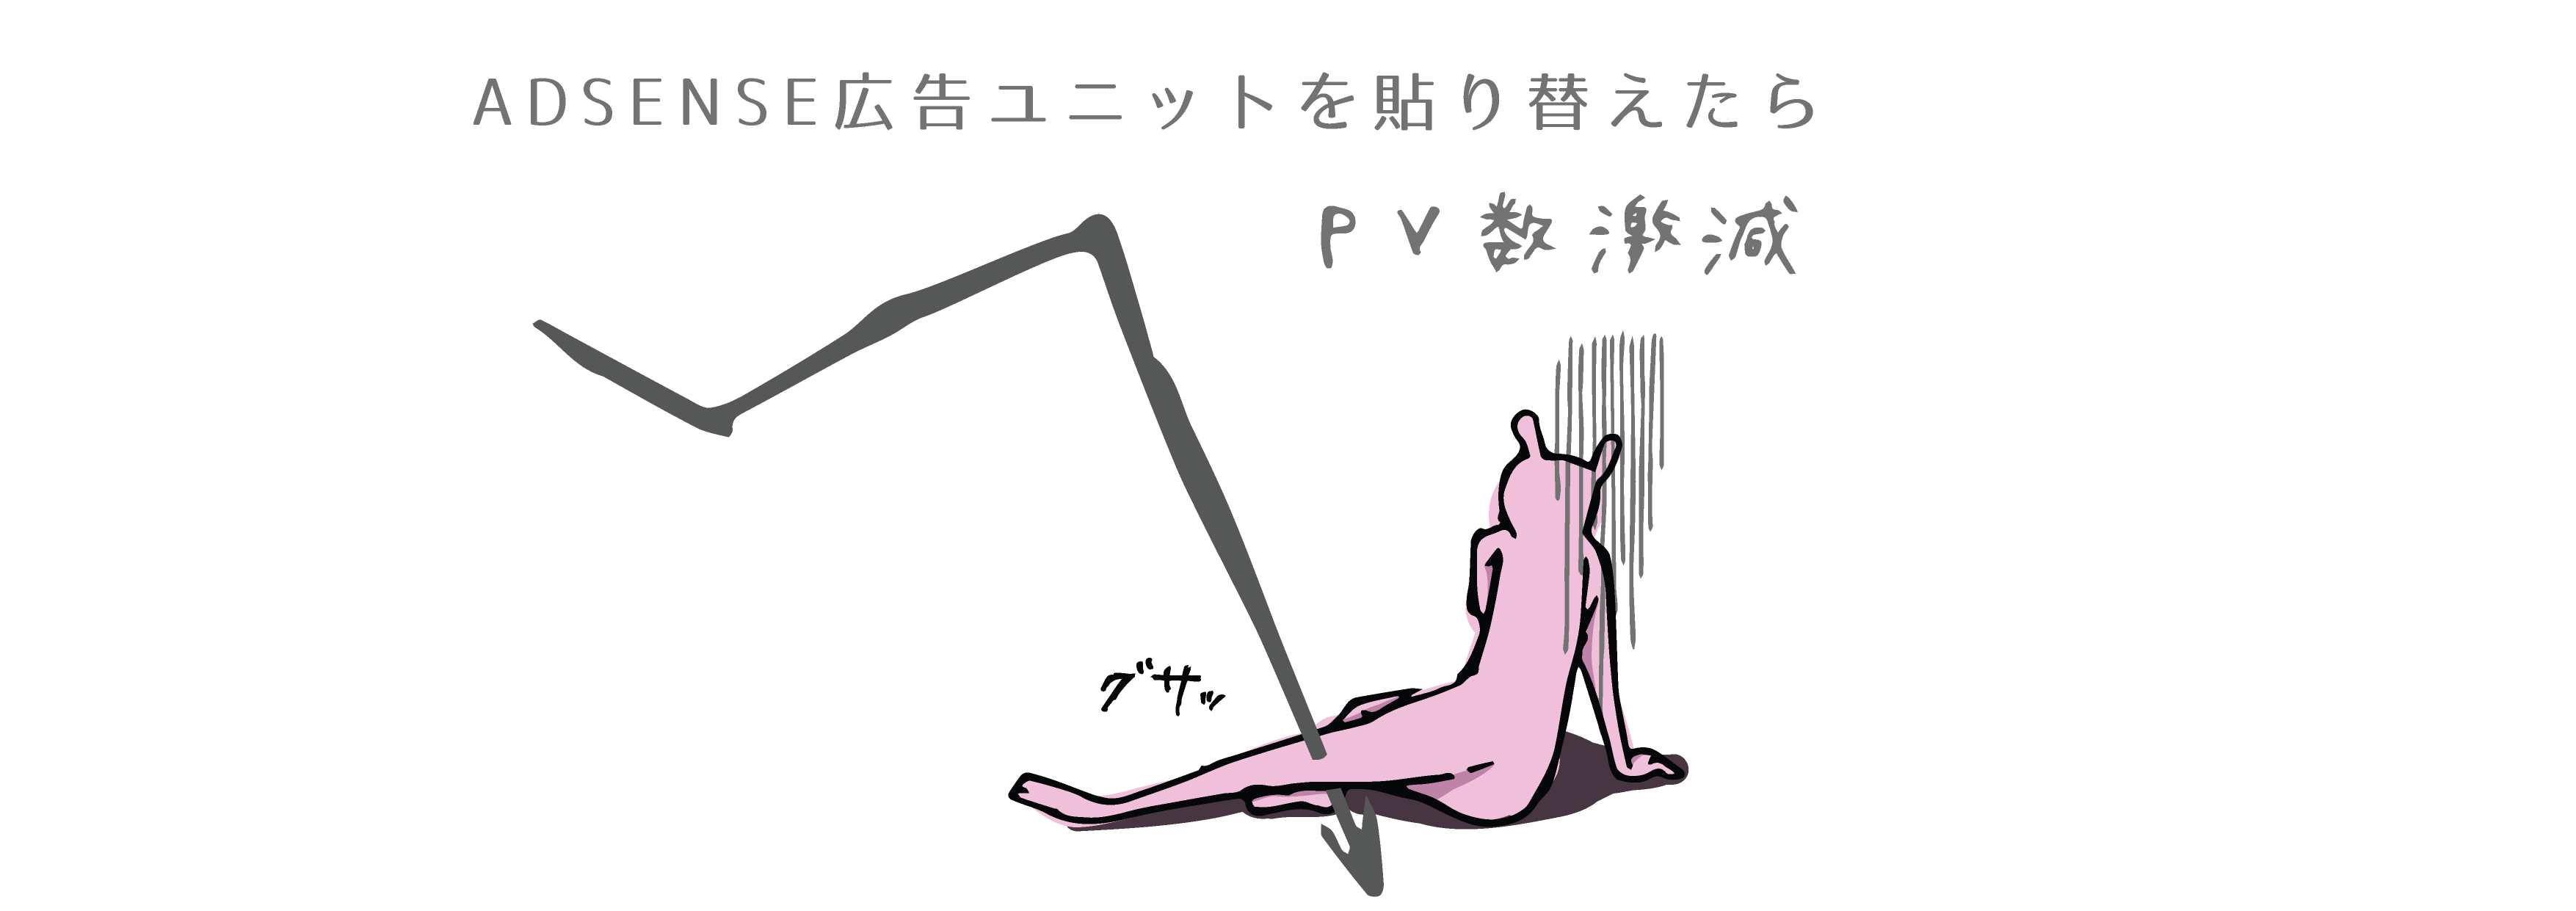 adsenseProblem 02